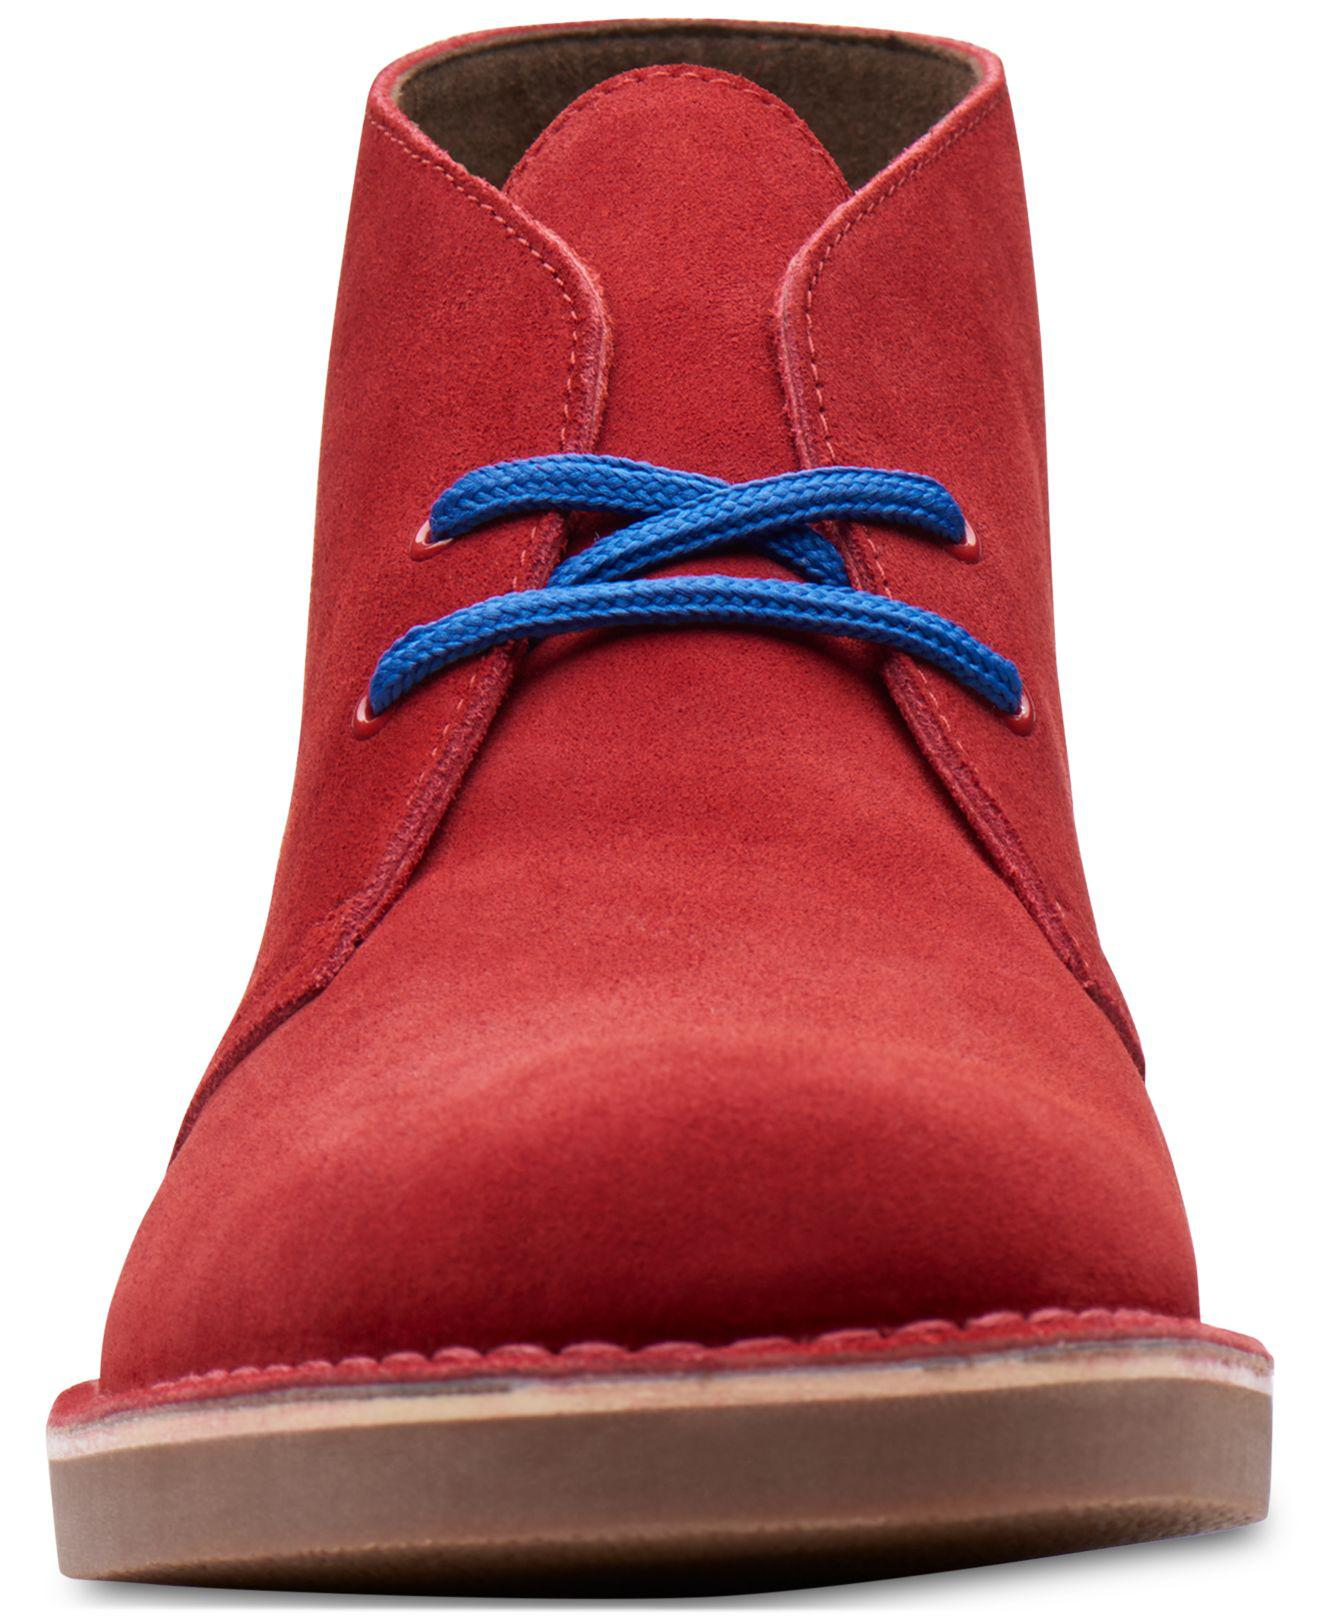 Clarks Men/'s Bushacre Ca Cherry Varsity Suede Casual Chukka Shoes 26141672